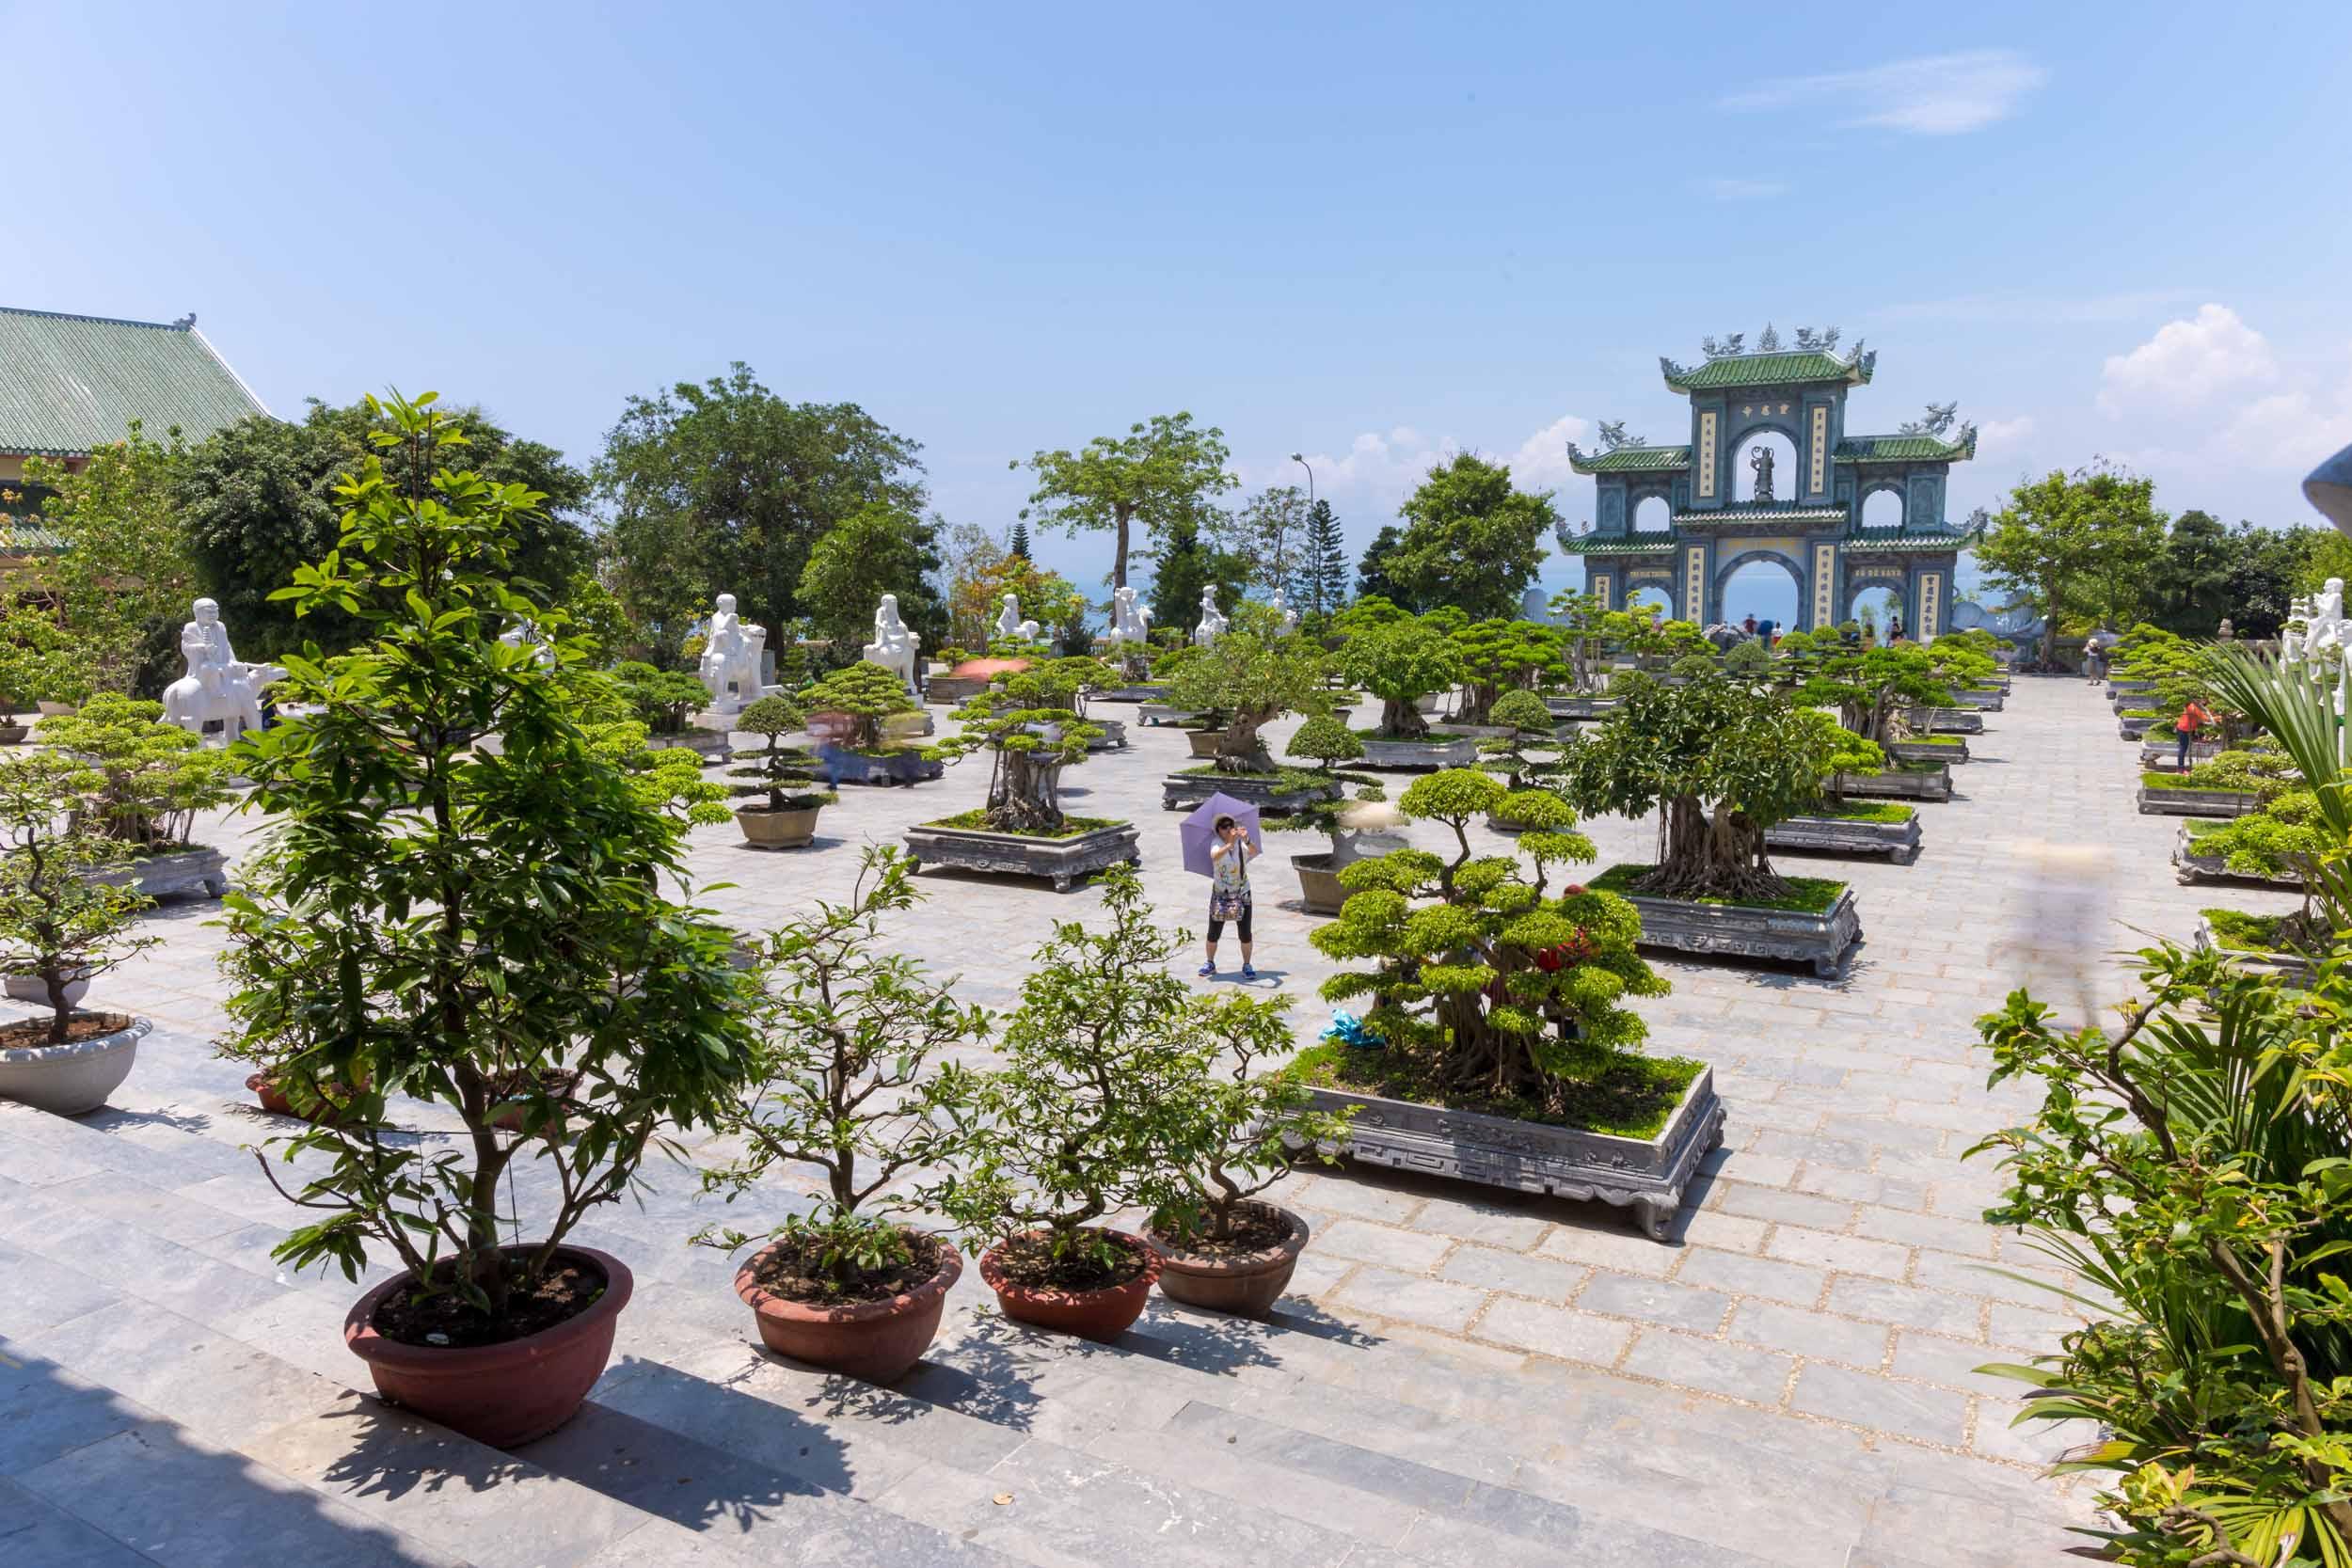 Temple courtyard, Son Tra, Da Nang, Vietnam.